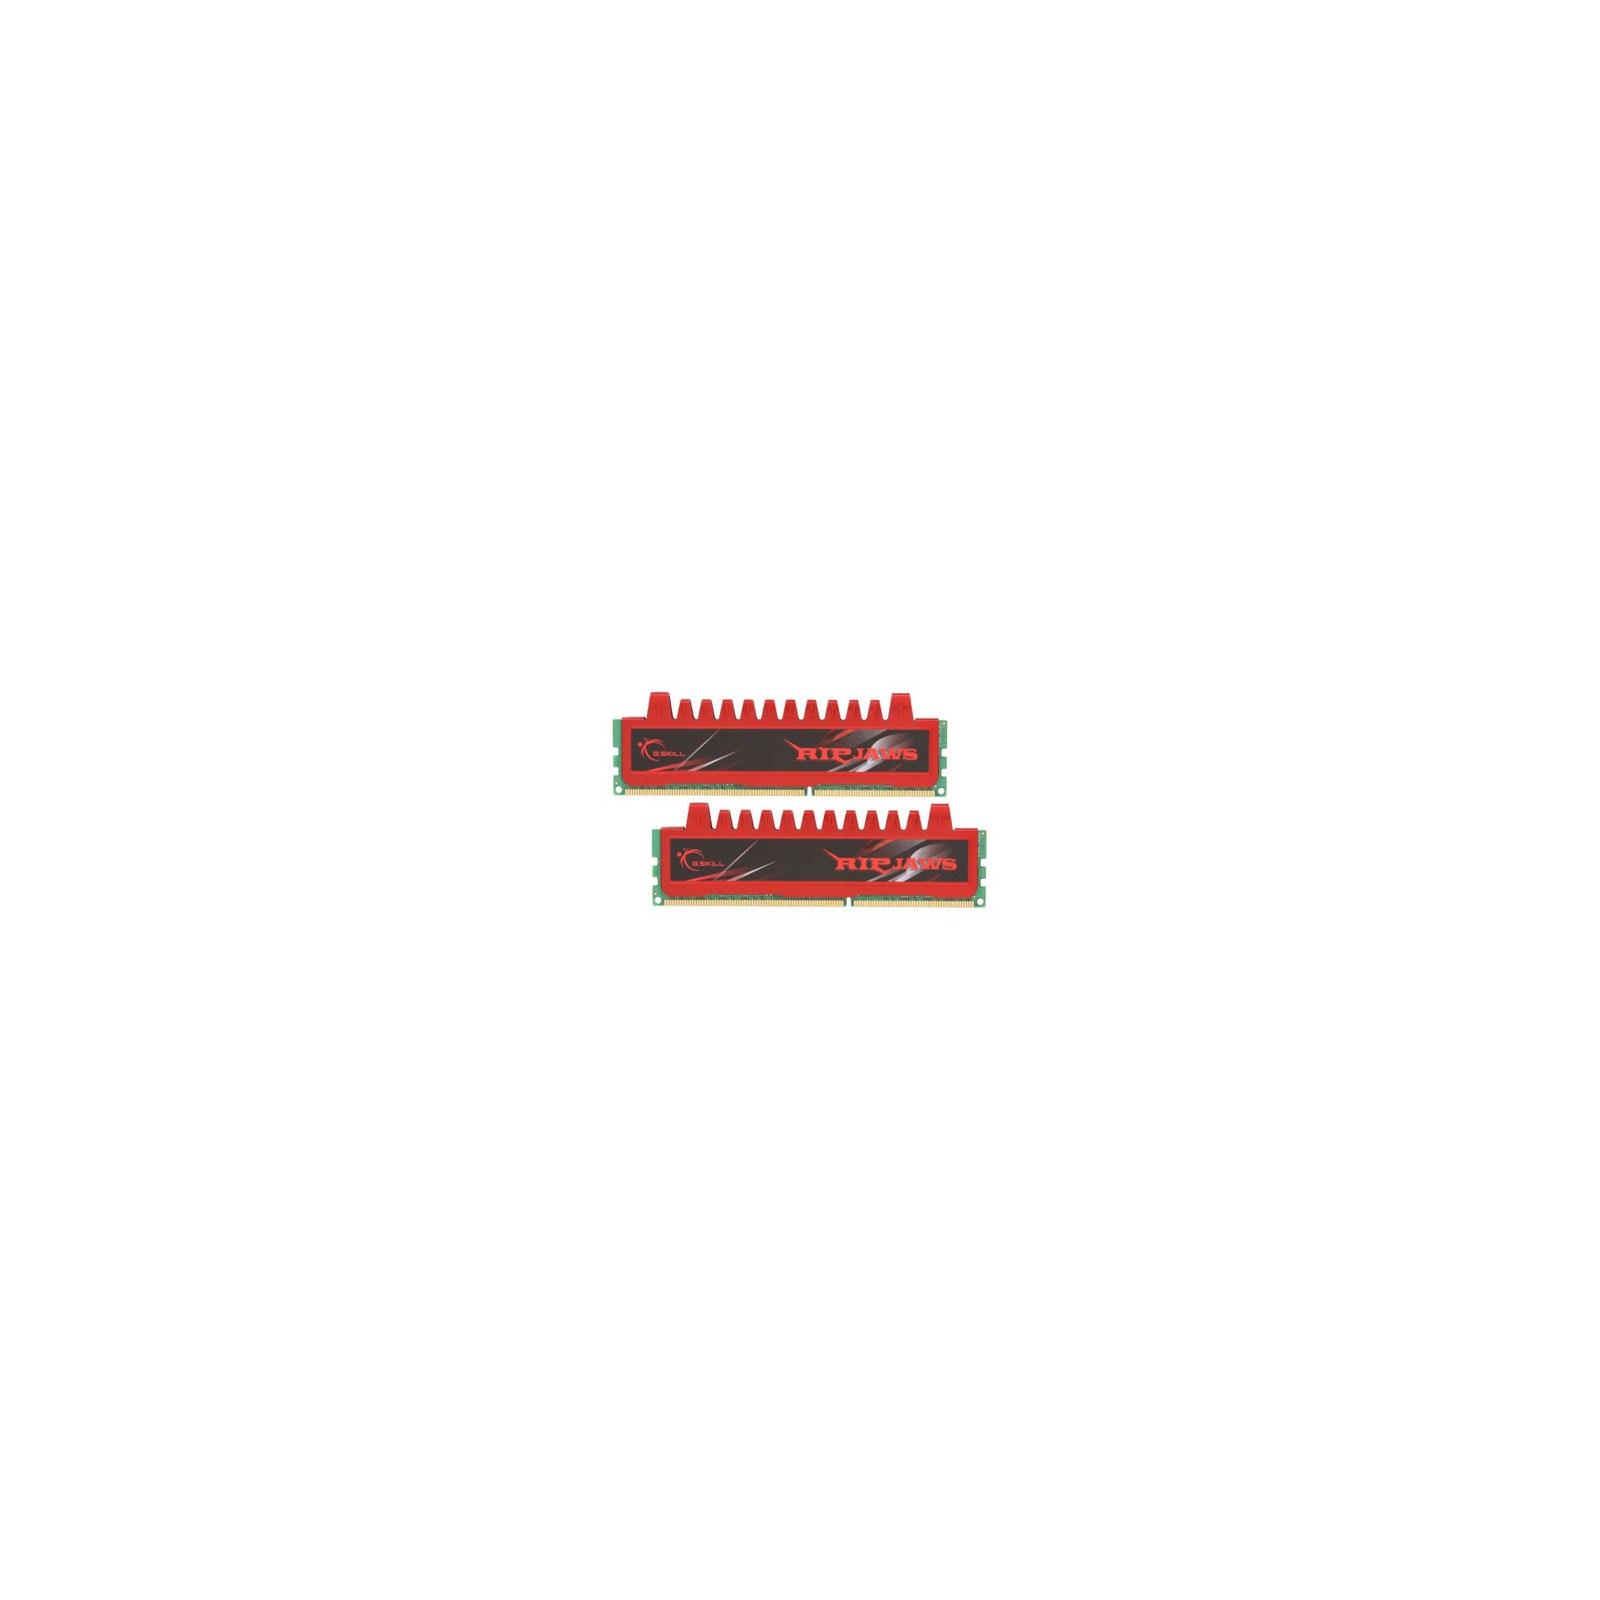 Модуль памяти для компьютера DDR3 8GB (2x4GB) 1600 MHz G.Skill (F3-12800CL9D-8GBRL)